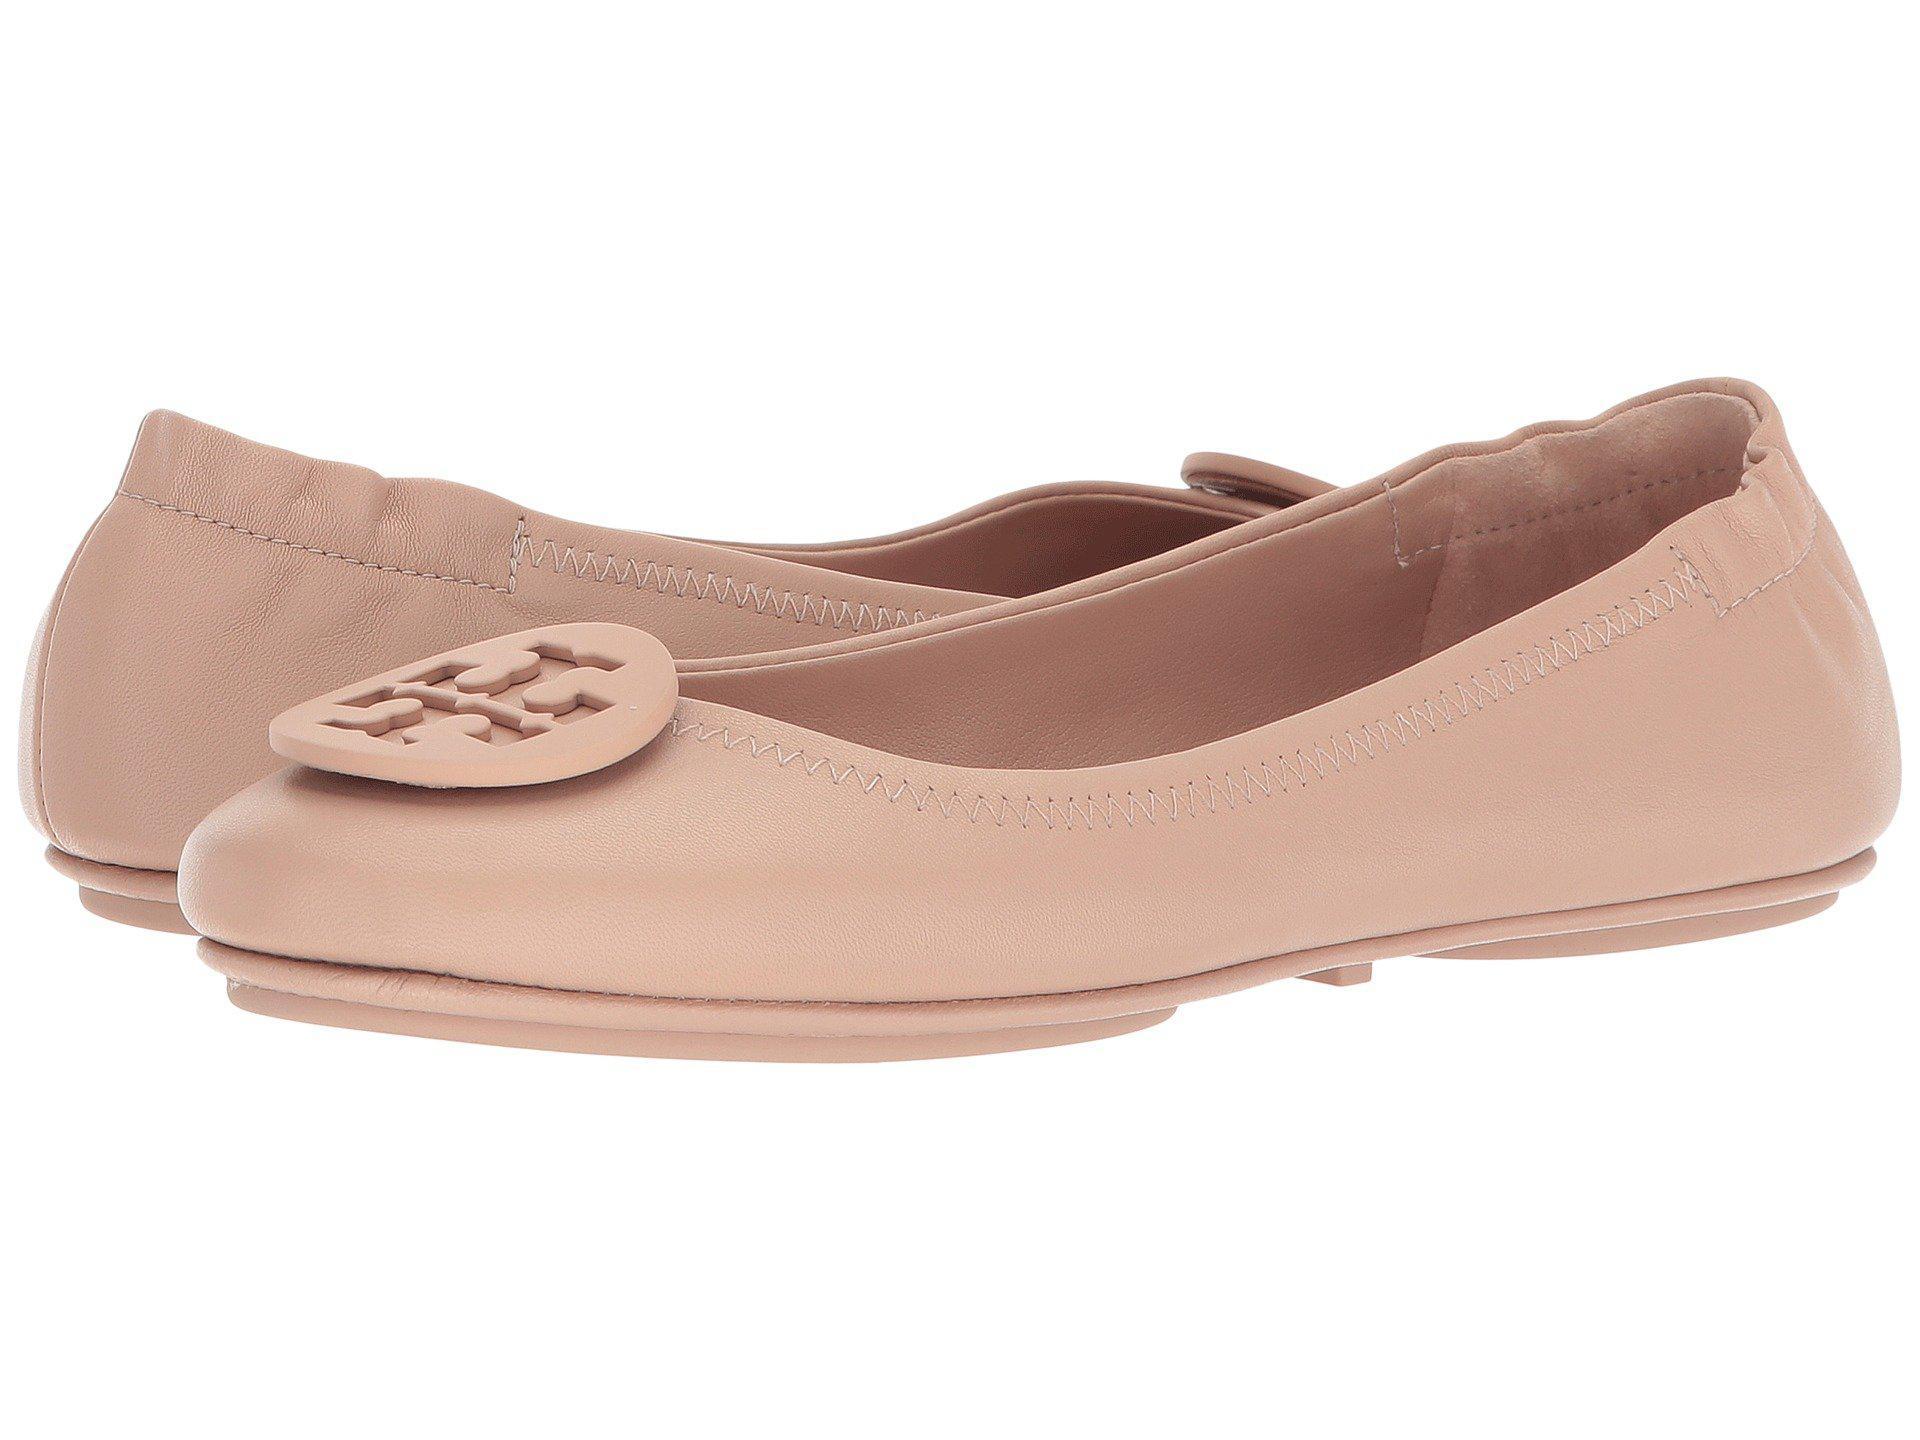 b99e0dc0695e Lyst - Tory Burch Minnie Travel Ballet Flat (black gold) Women s Shoes